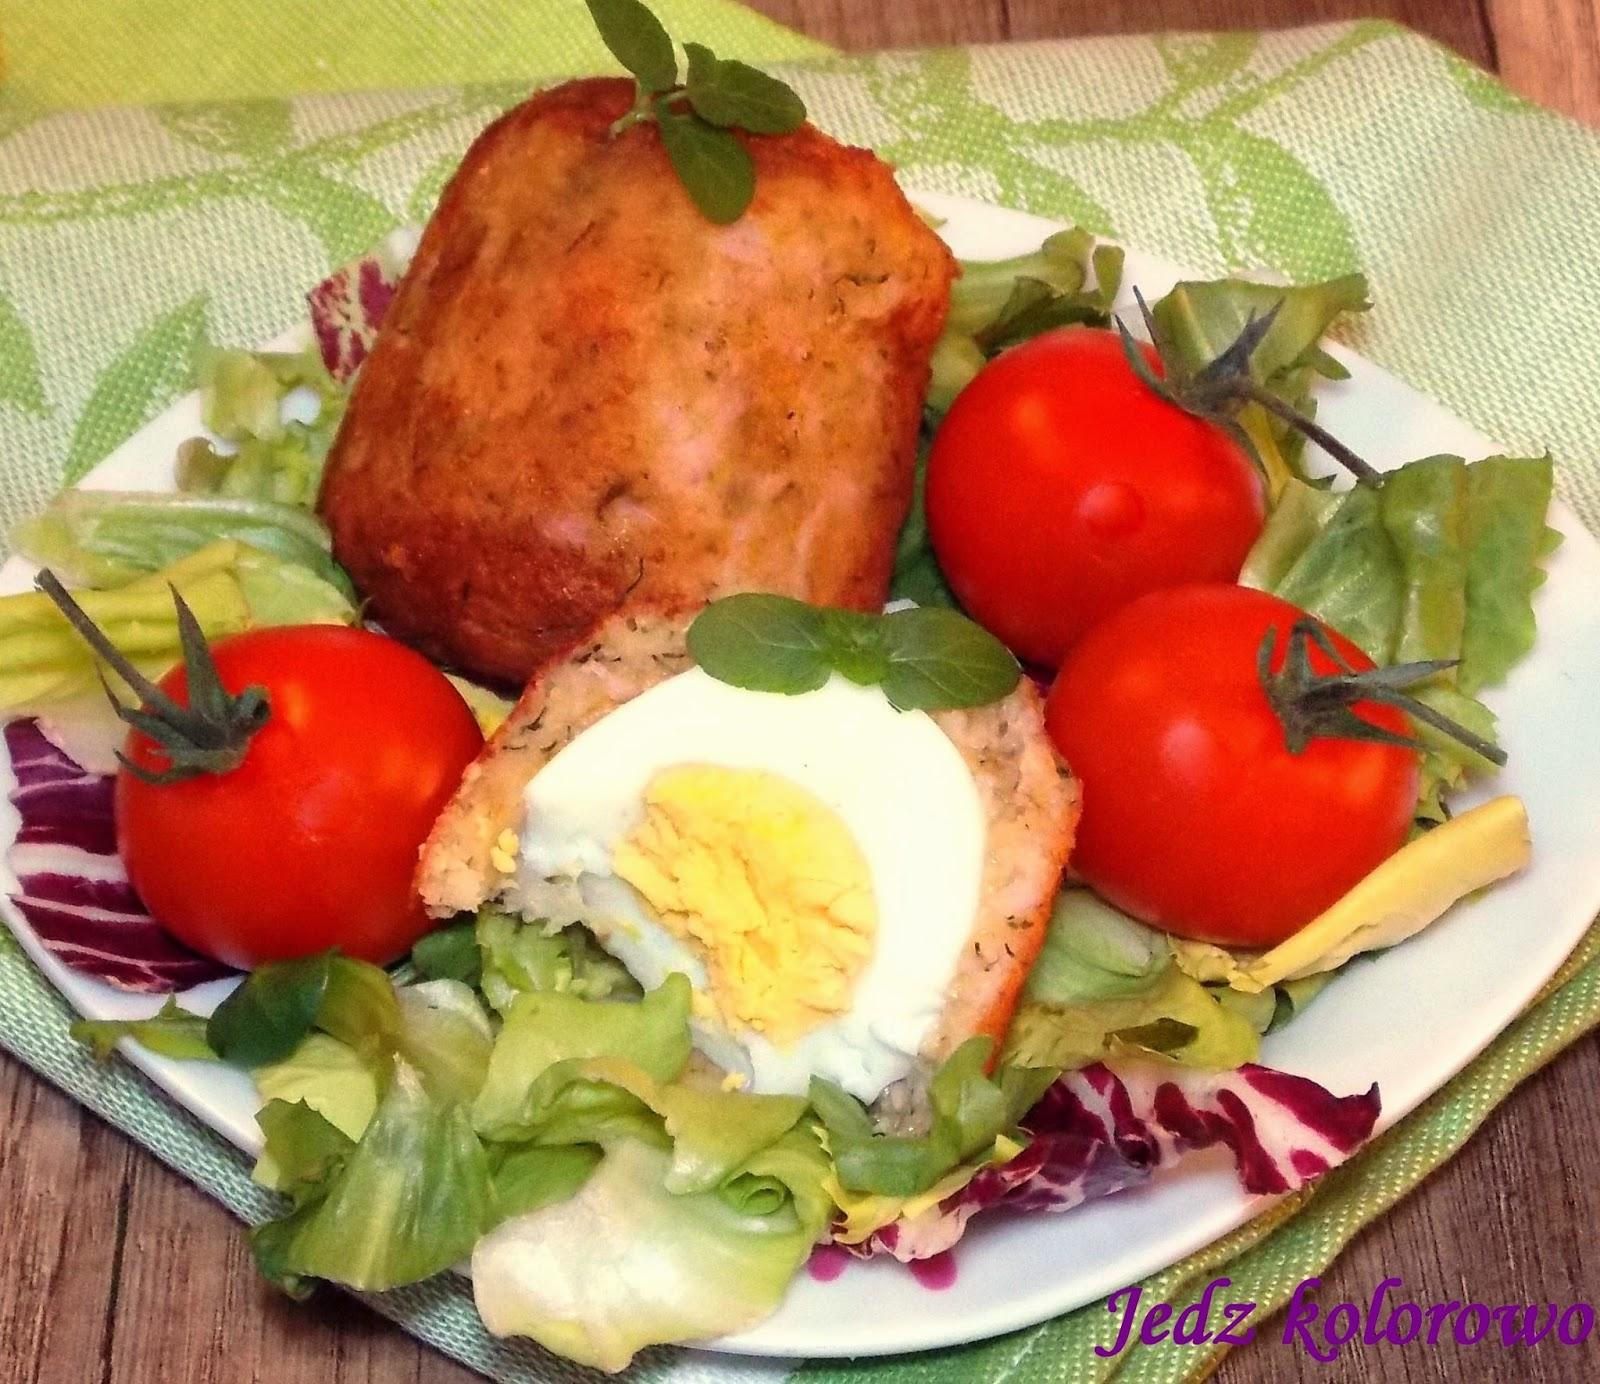 jajka w panierce